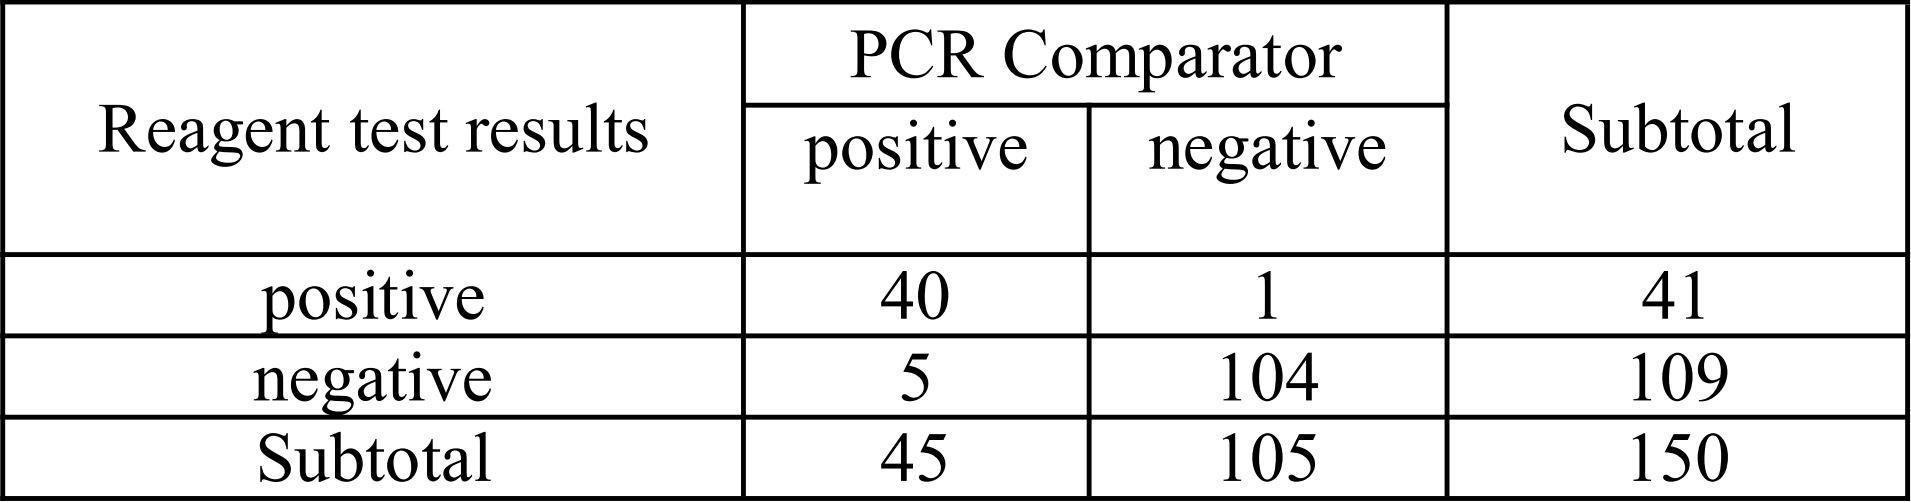 JOYSBIO Coronavirus Antigen (Ag) Test Kit Clinical Evaluation Data